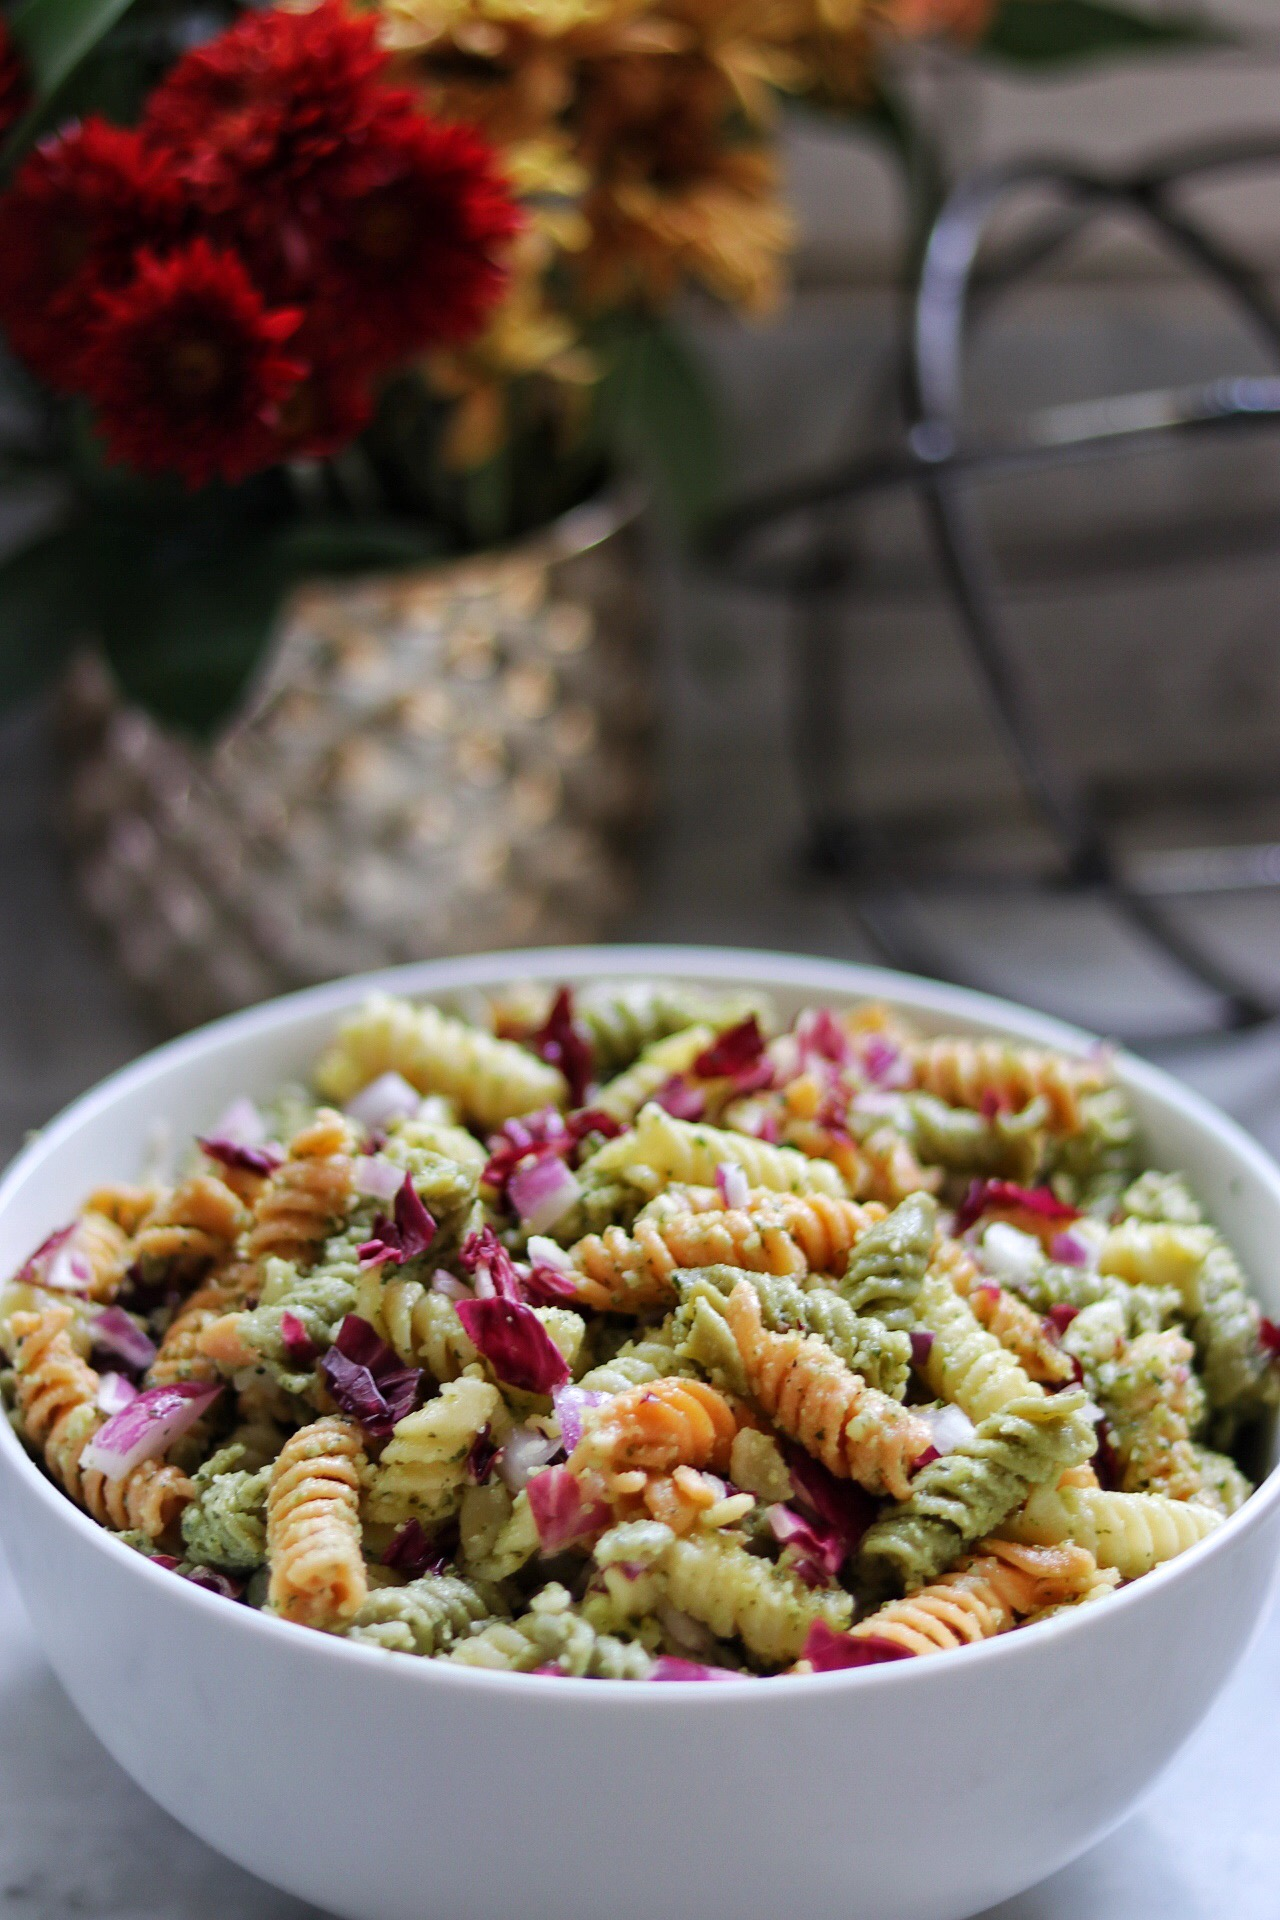 Maya's Perfect Pesto Pasta Salad